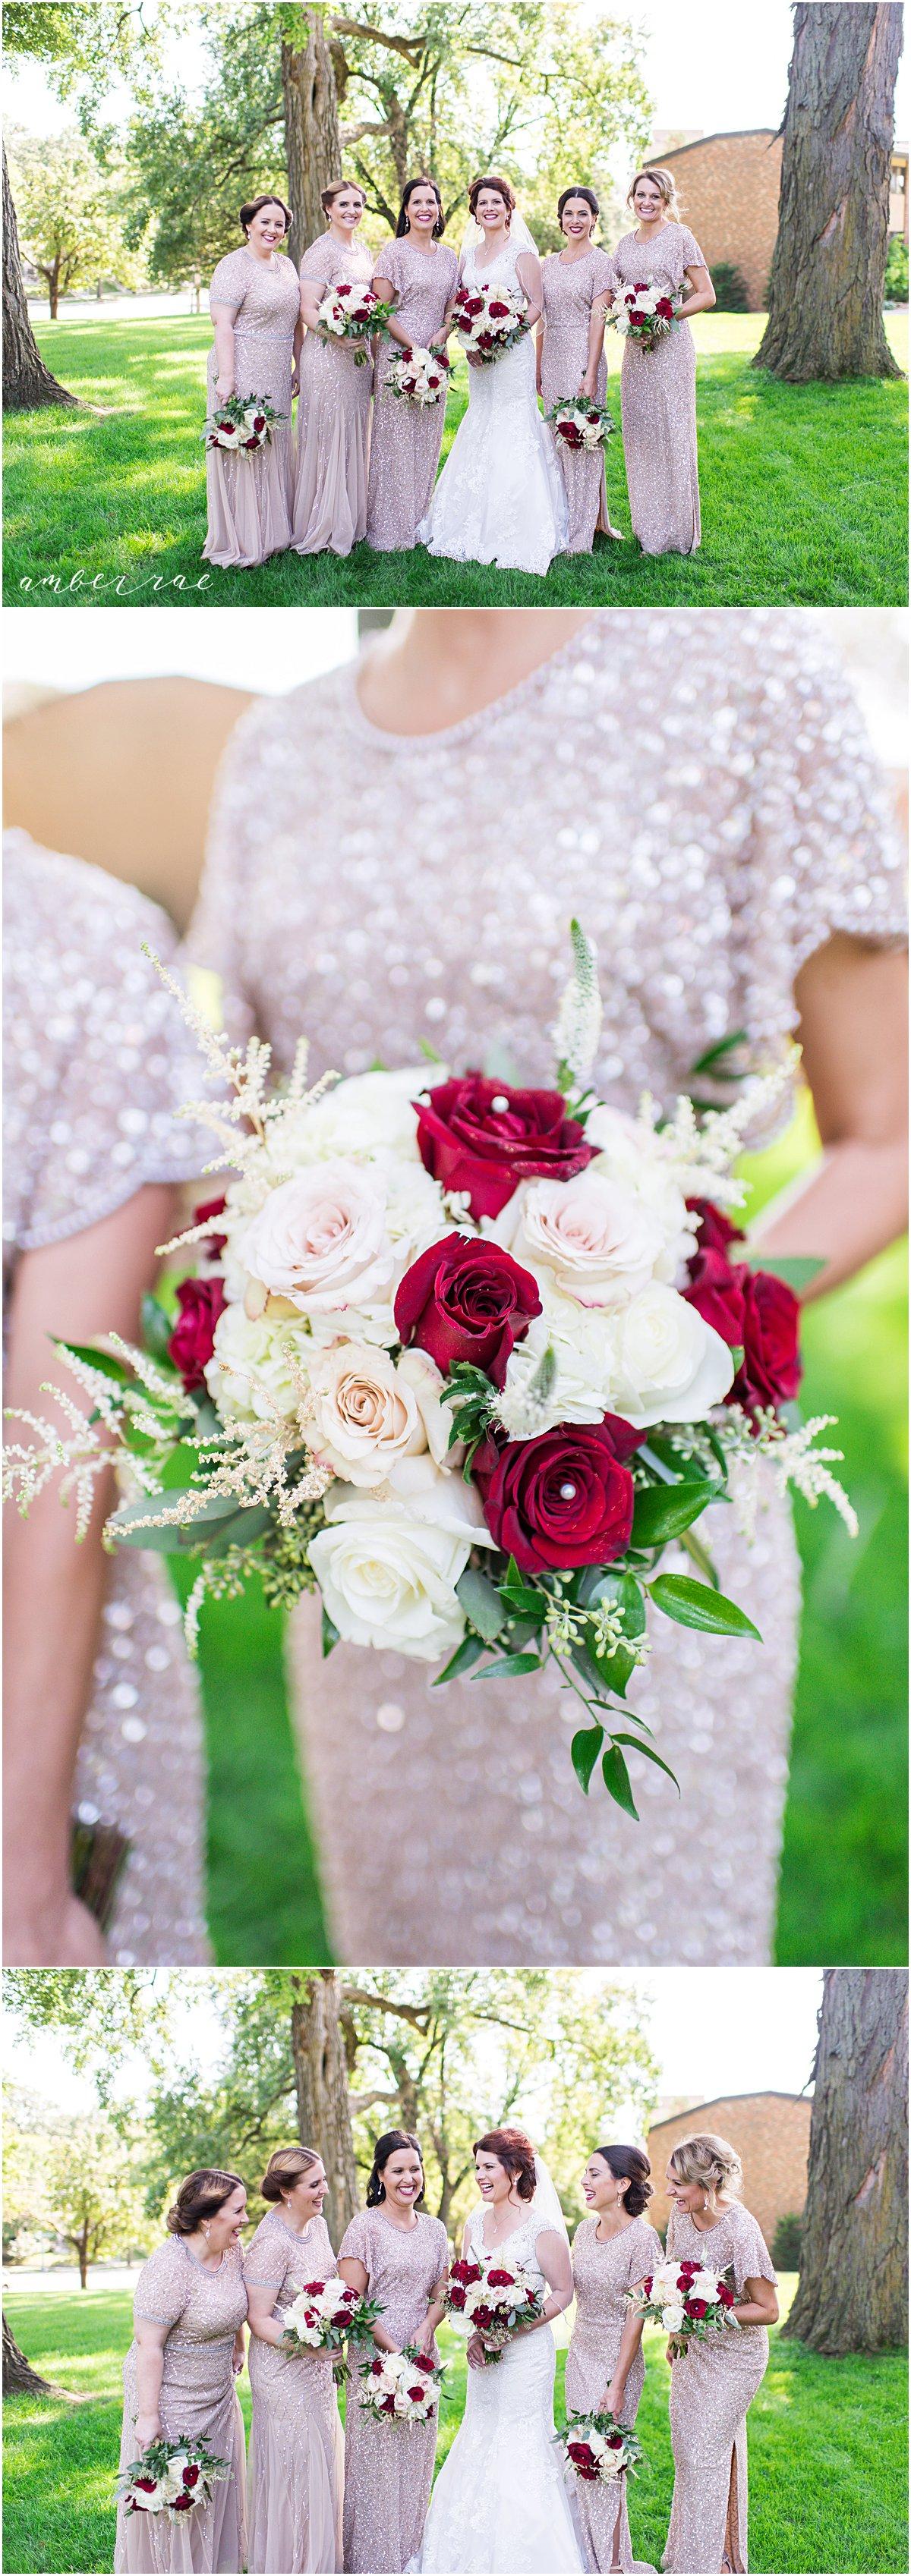 Gustafson Wedding 2018_0011.jpg